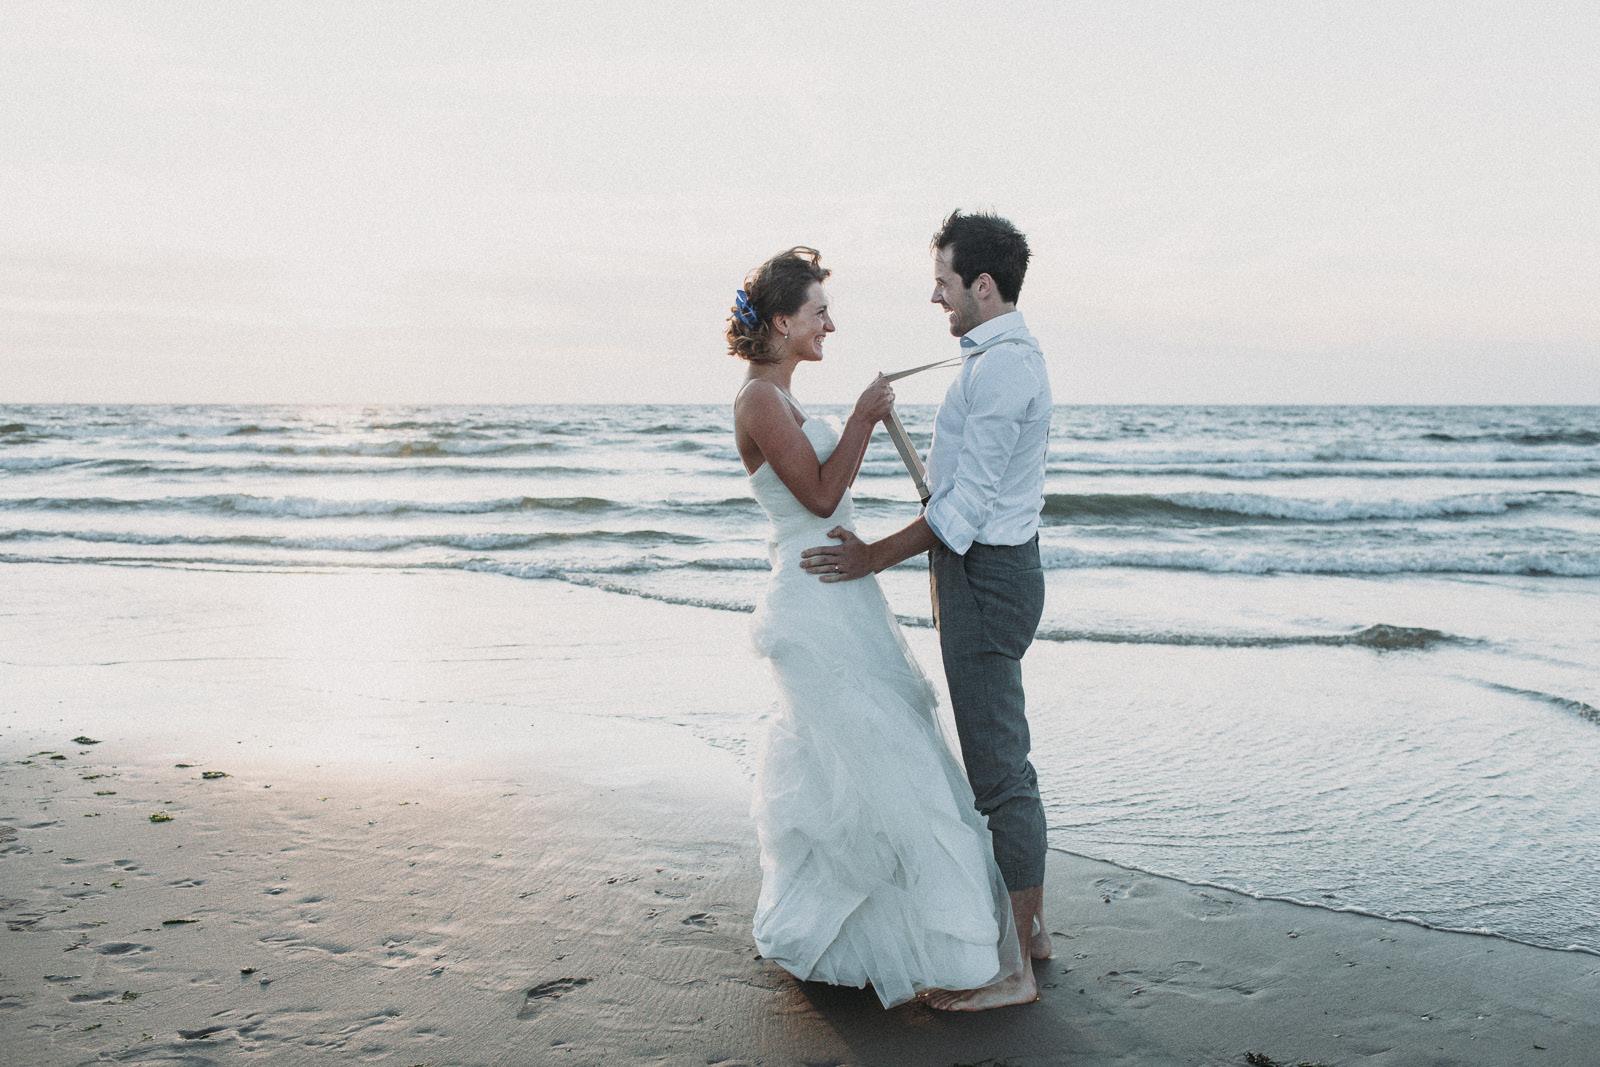 Evabloem_trouwen-sint-joris-doele_strandpaviljoen-zuid-78.jpg